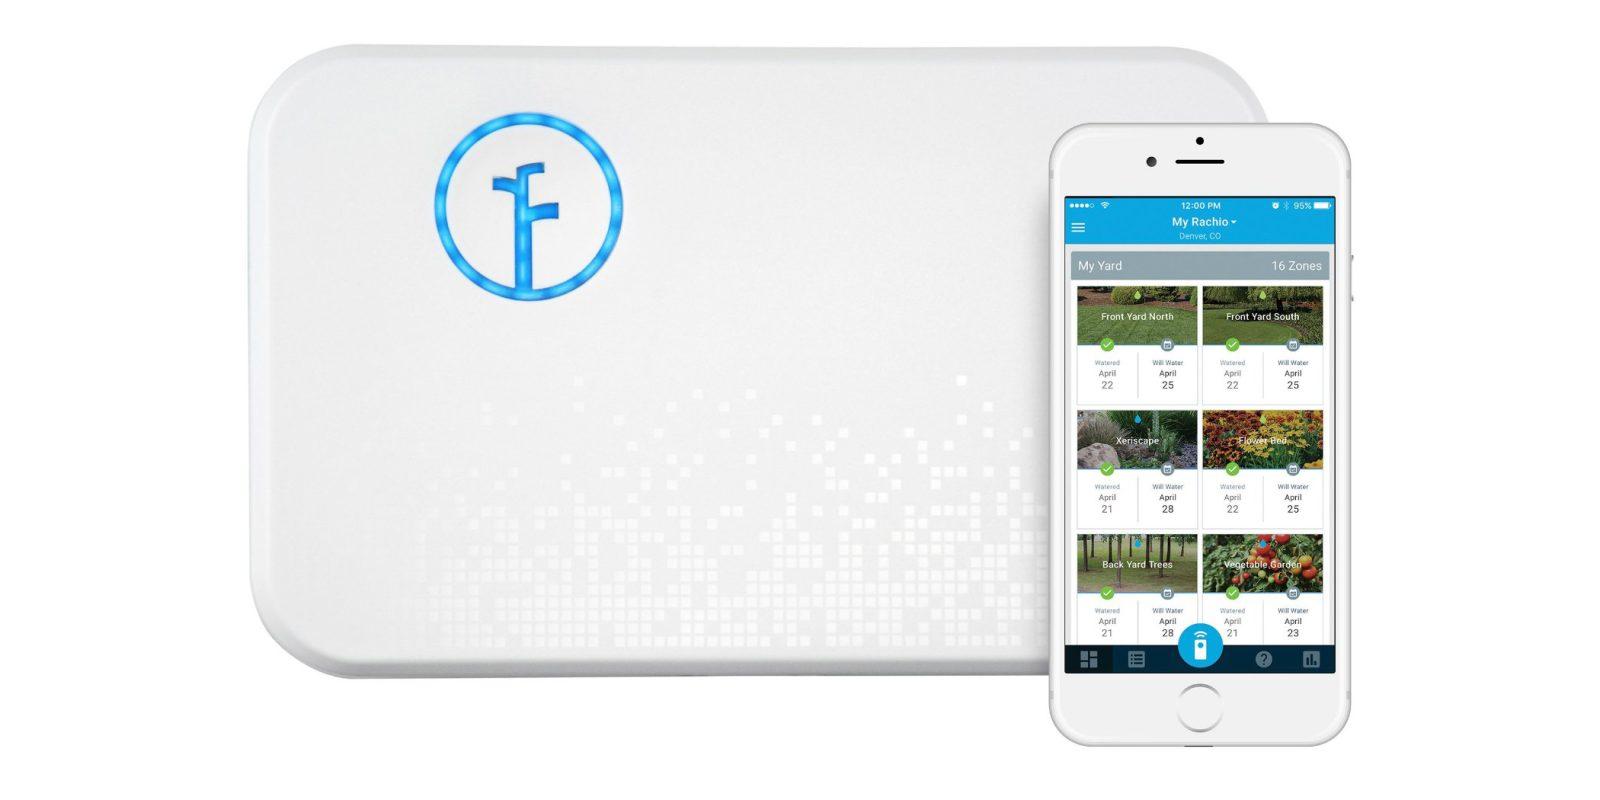 Rachio's popular smart sprinkler controller is $100, beating the Amazon low